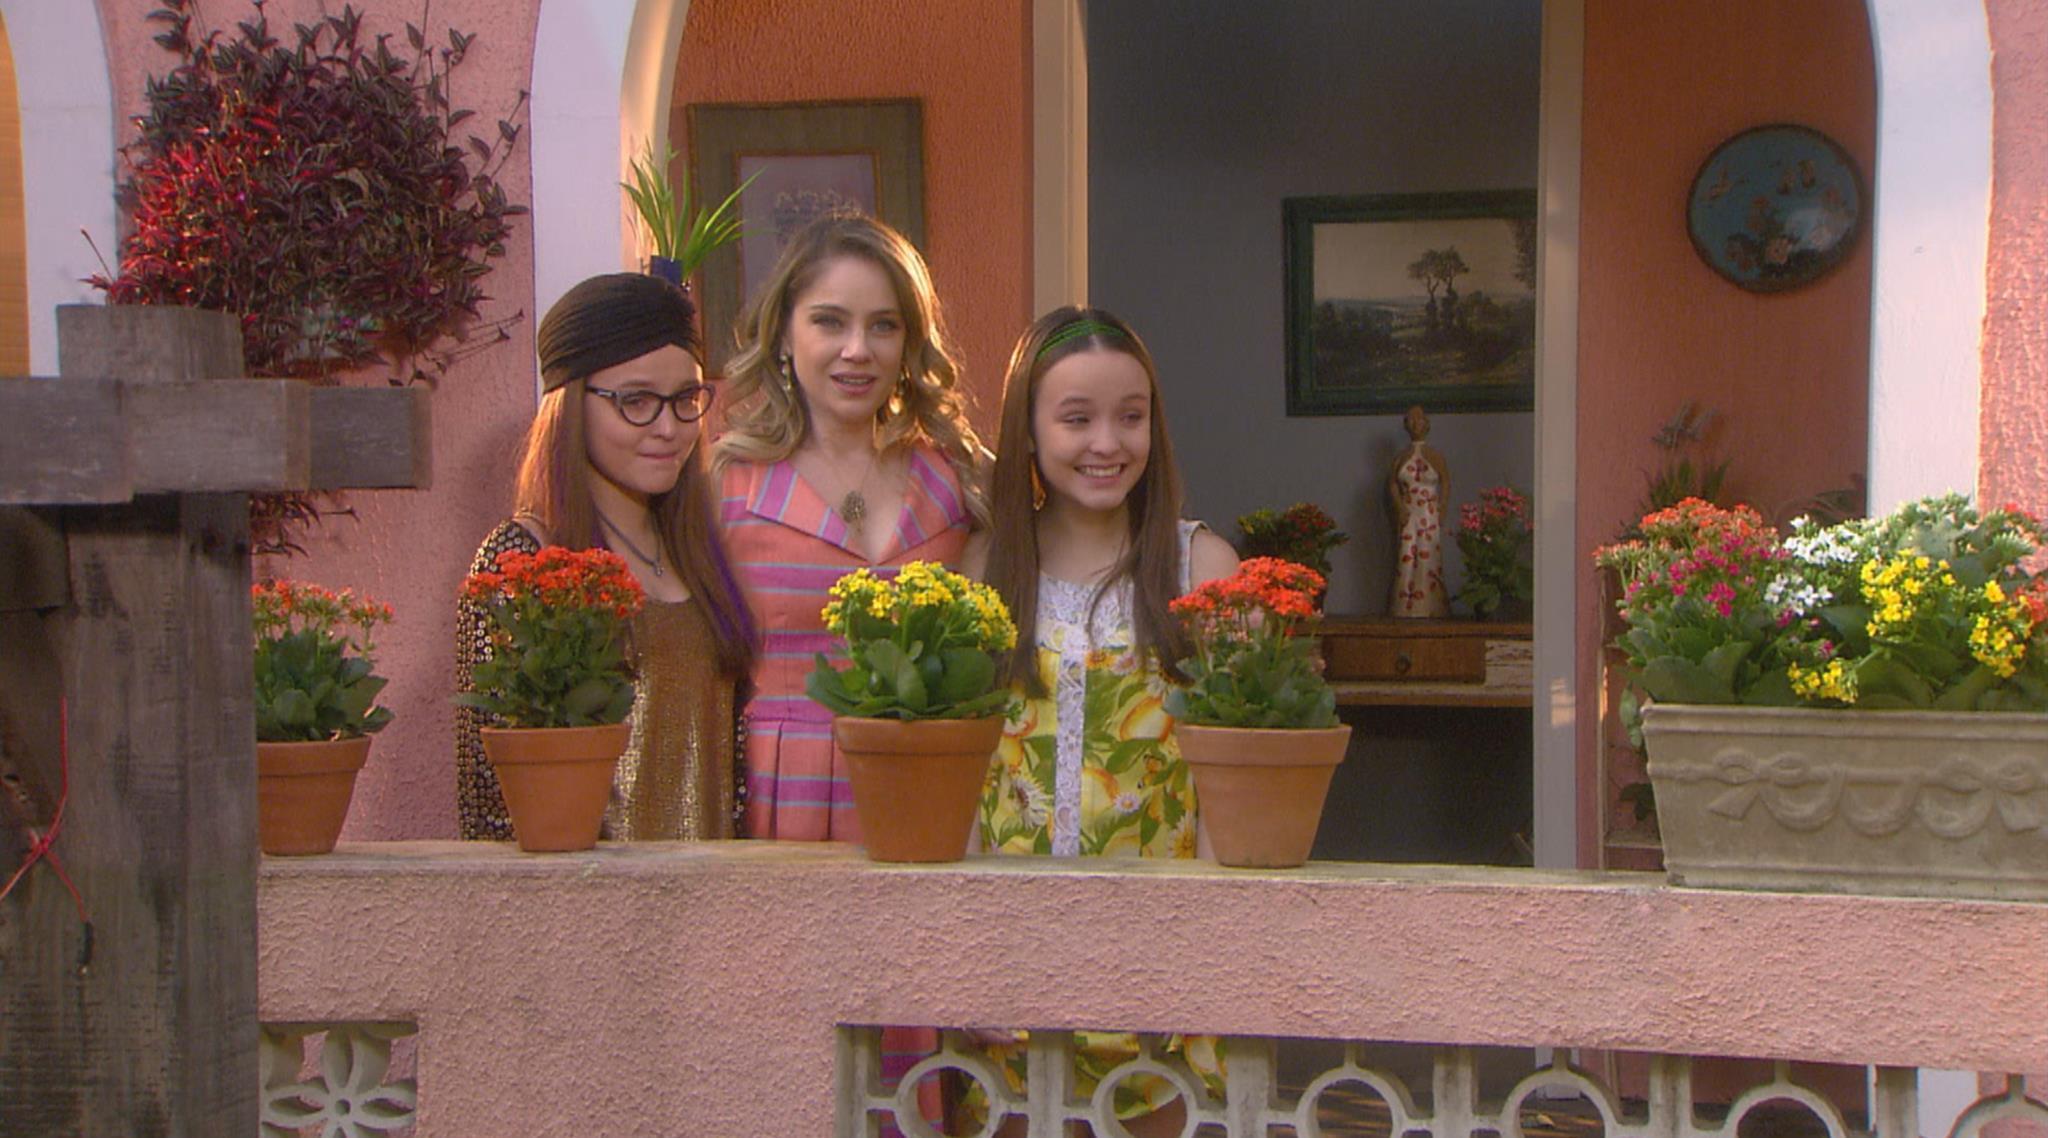 Isabela (Larissa Manoela), Rebeca (Juliana Baroni) e Manuela (Larissa Manoela) (Foto: Divulgação/SBT)